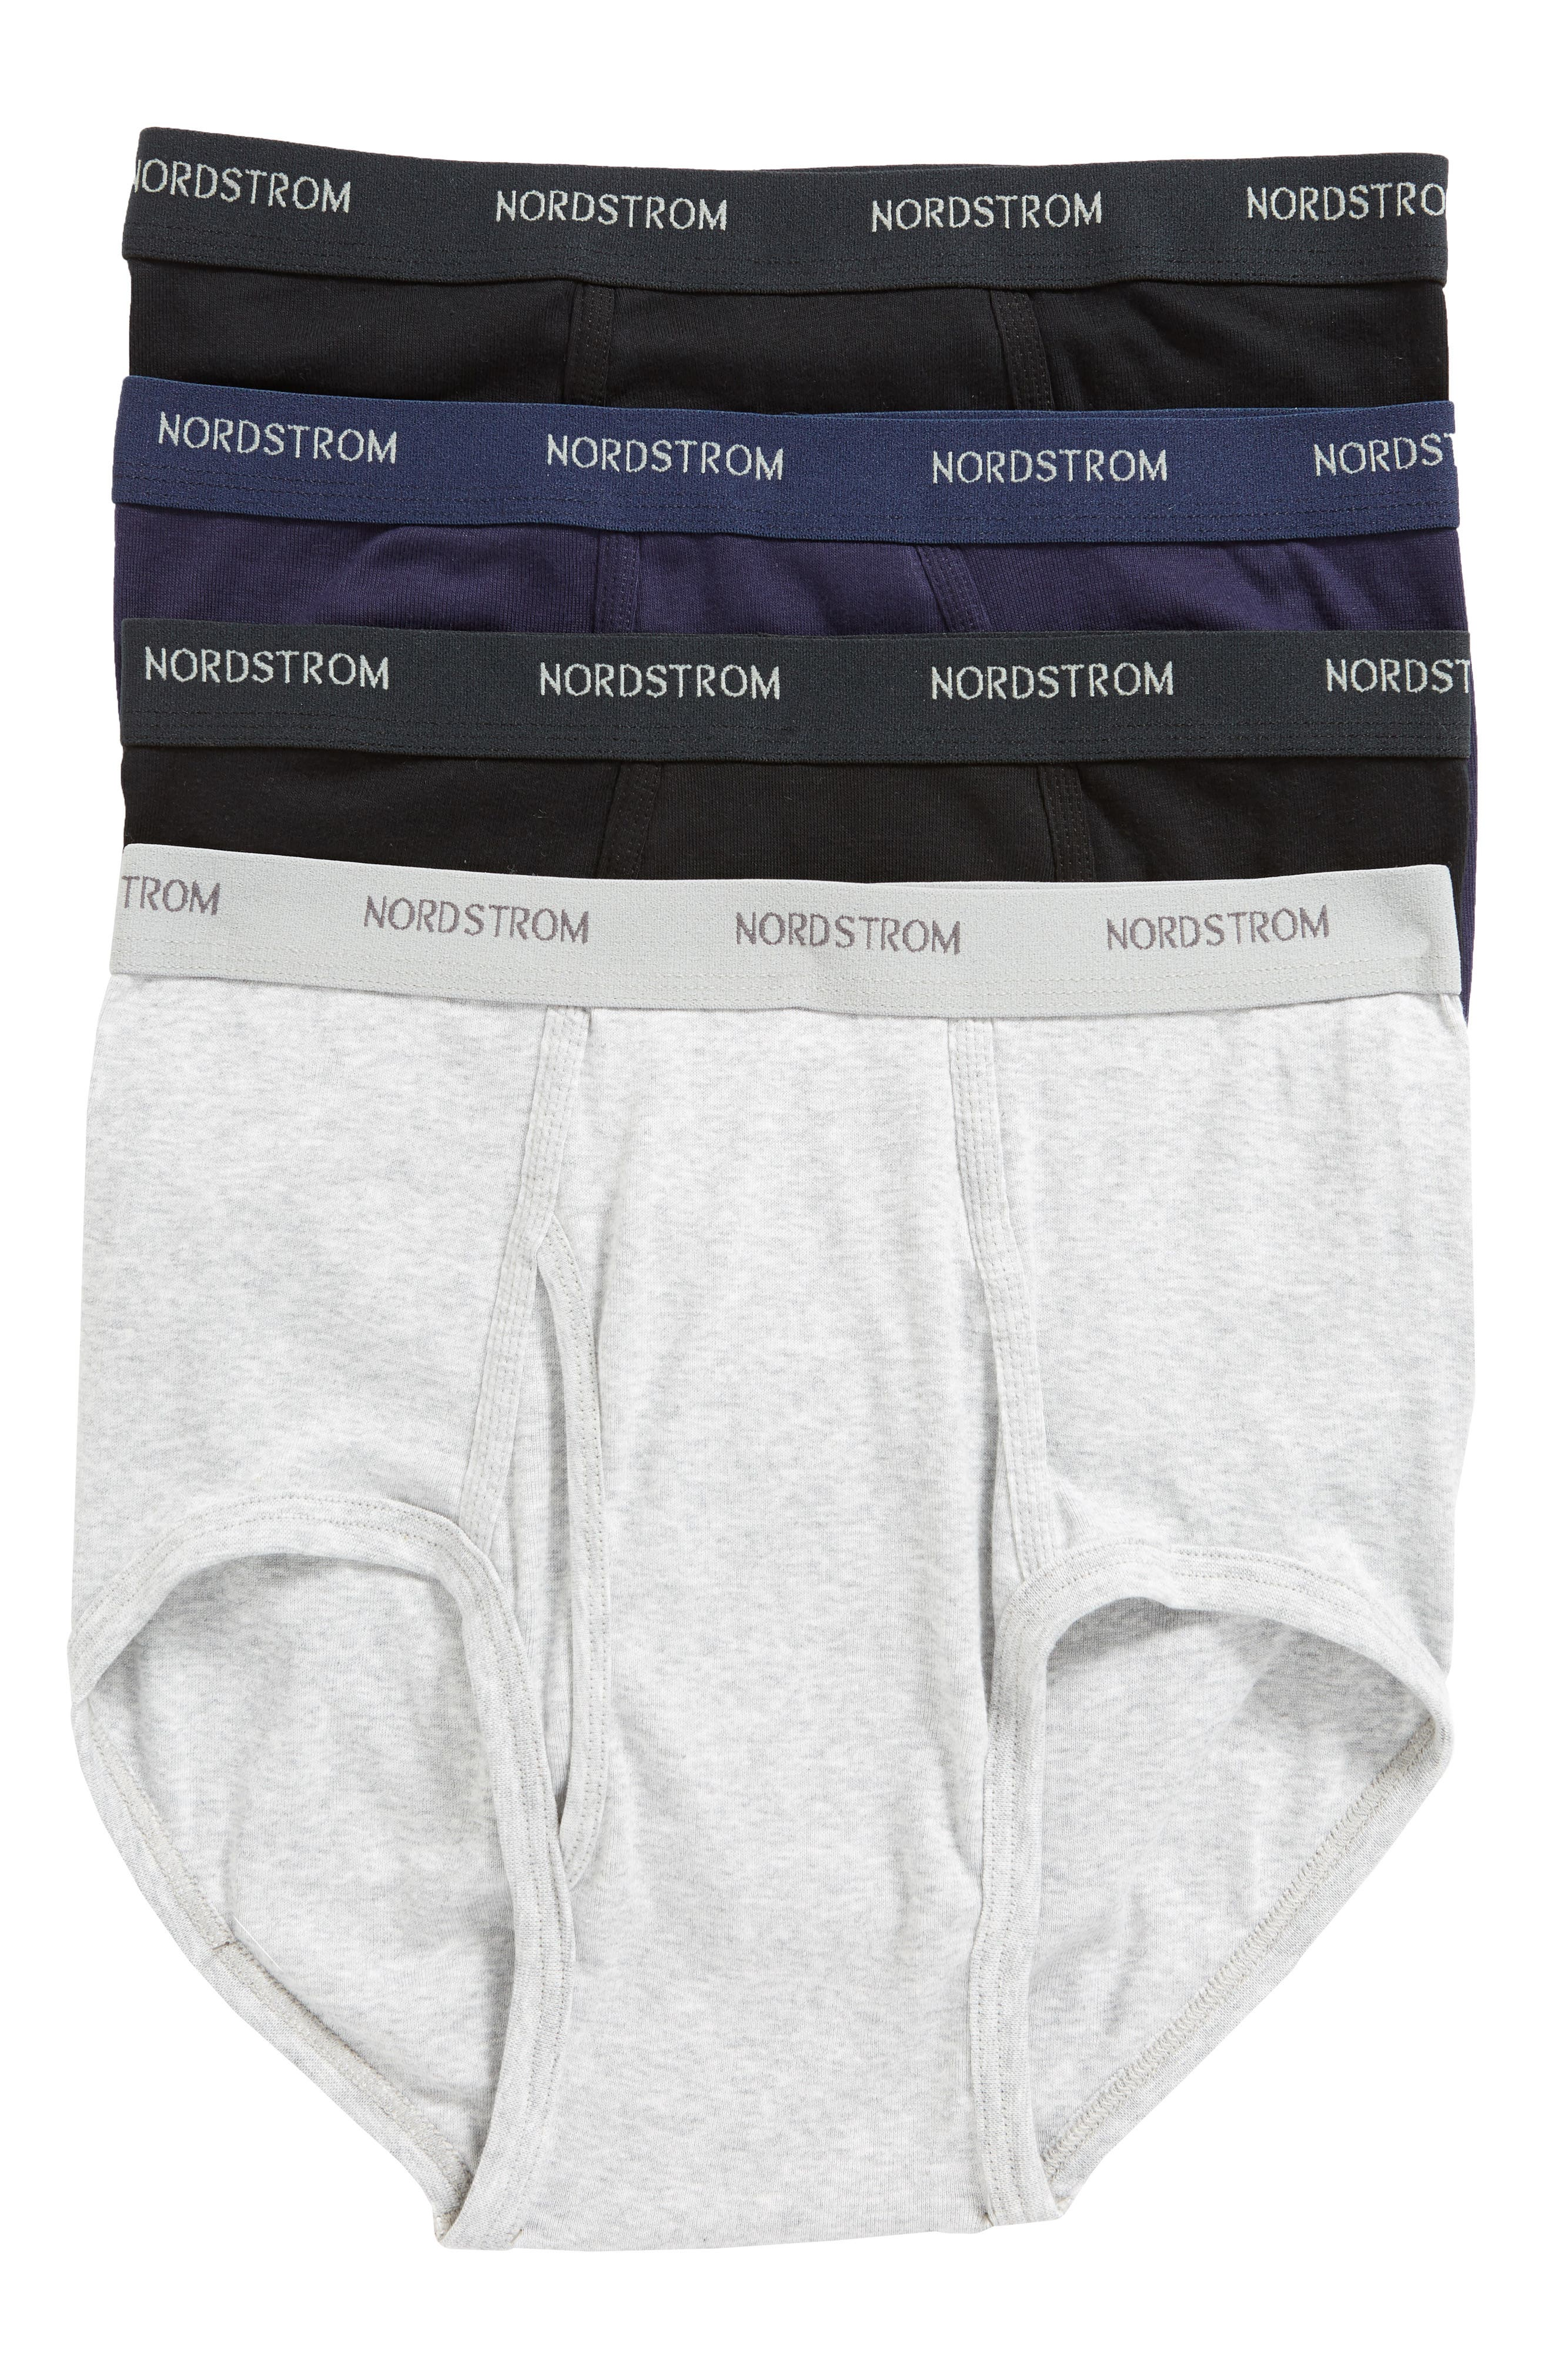 NORDSTROM MEN'S SHOP 4-Pack Supima<sup>®</sup> Cotton Briefs, Main, color, BLACK/ NAVY/ GREY